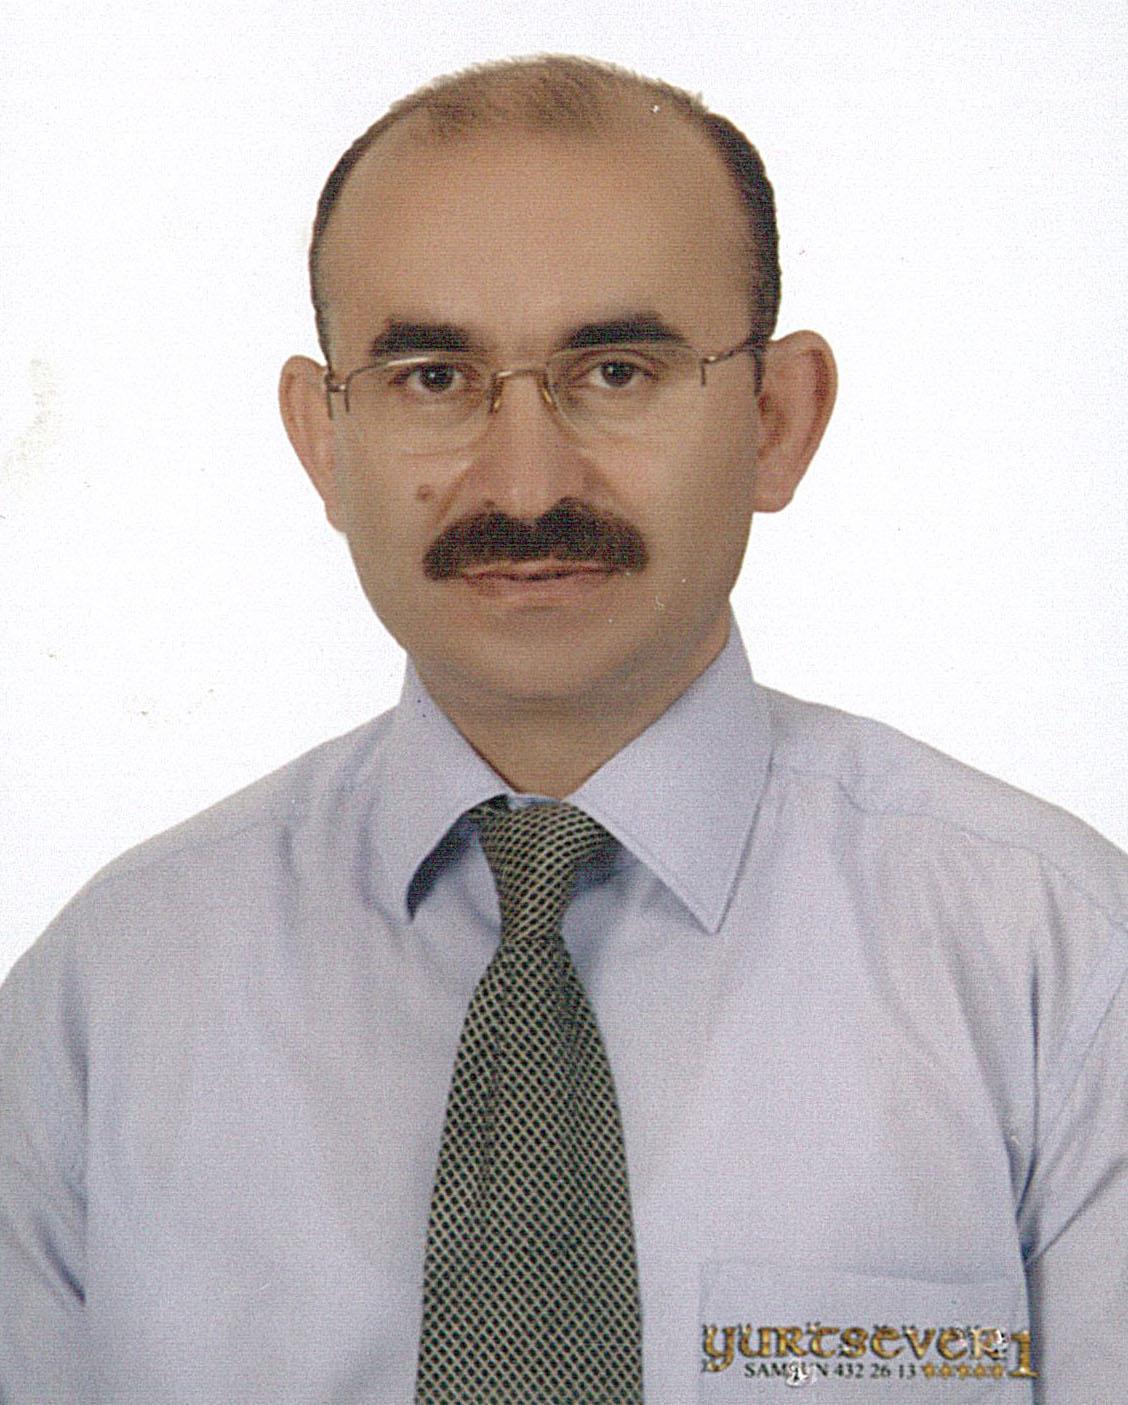 Doç. Dr. İHSAN ARSLAN